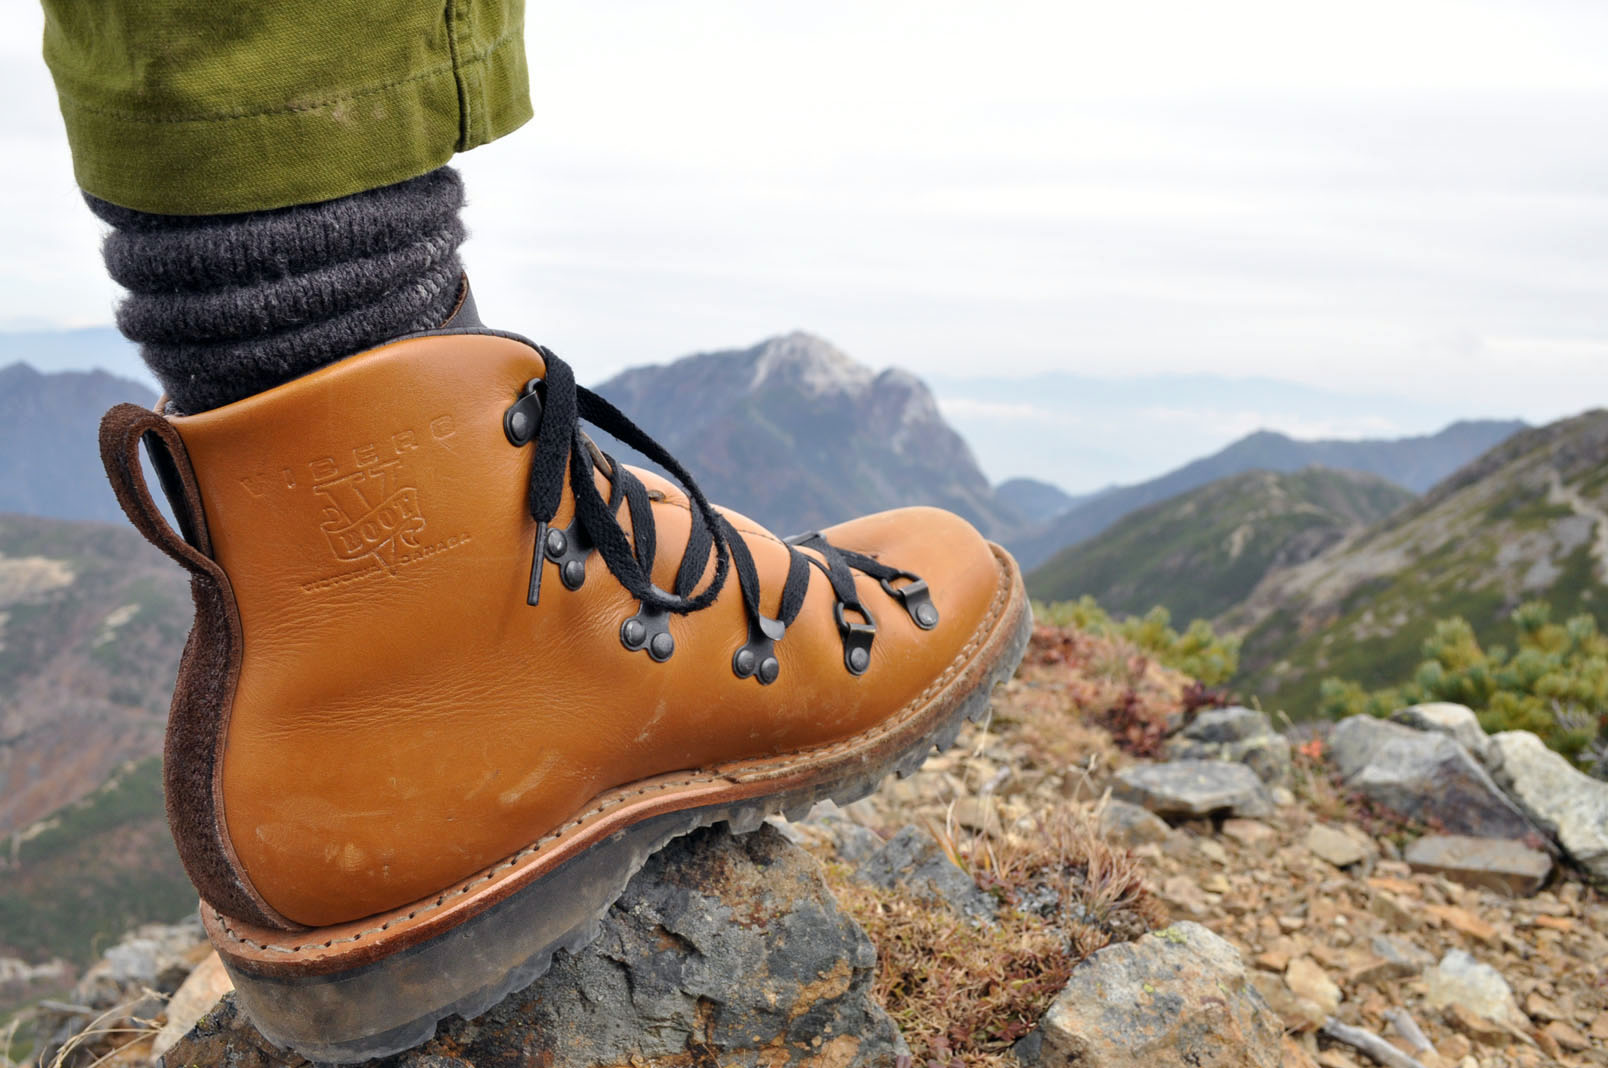 2bd3cfda37d ▷ Classement   Guide d achat  Top chaussures de randonnee En Mai 2019